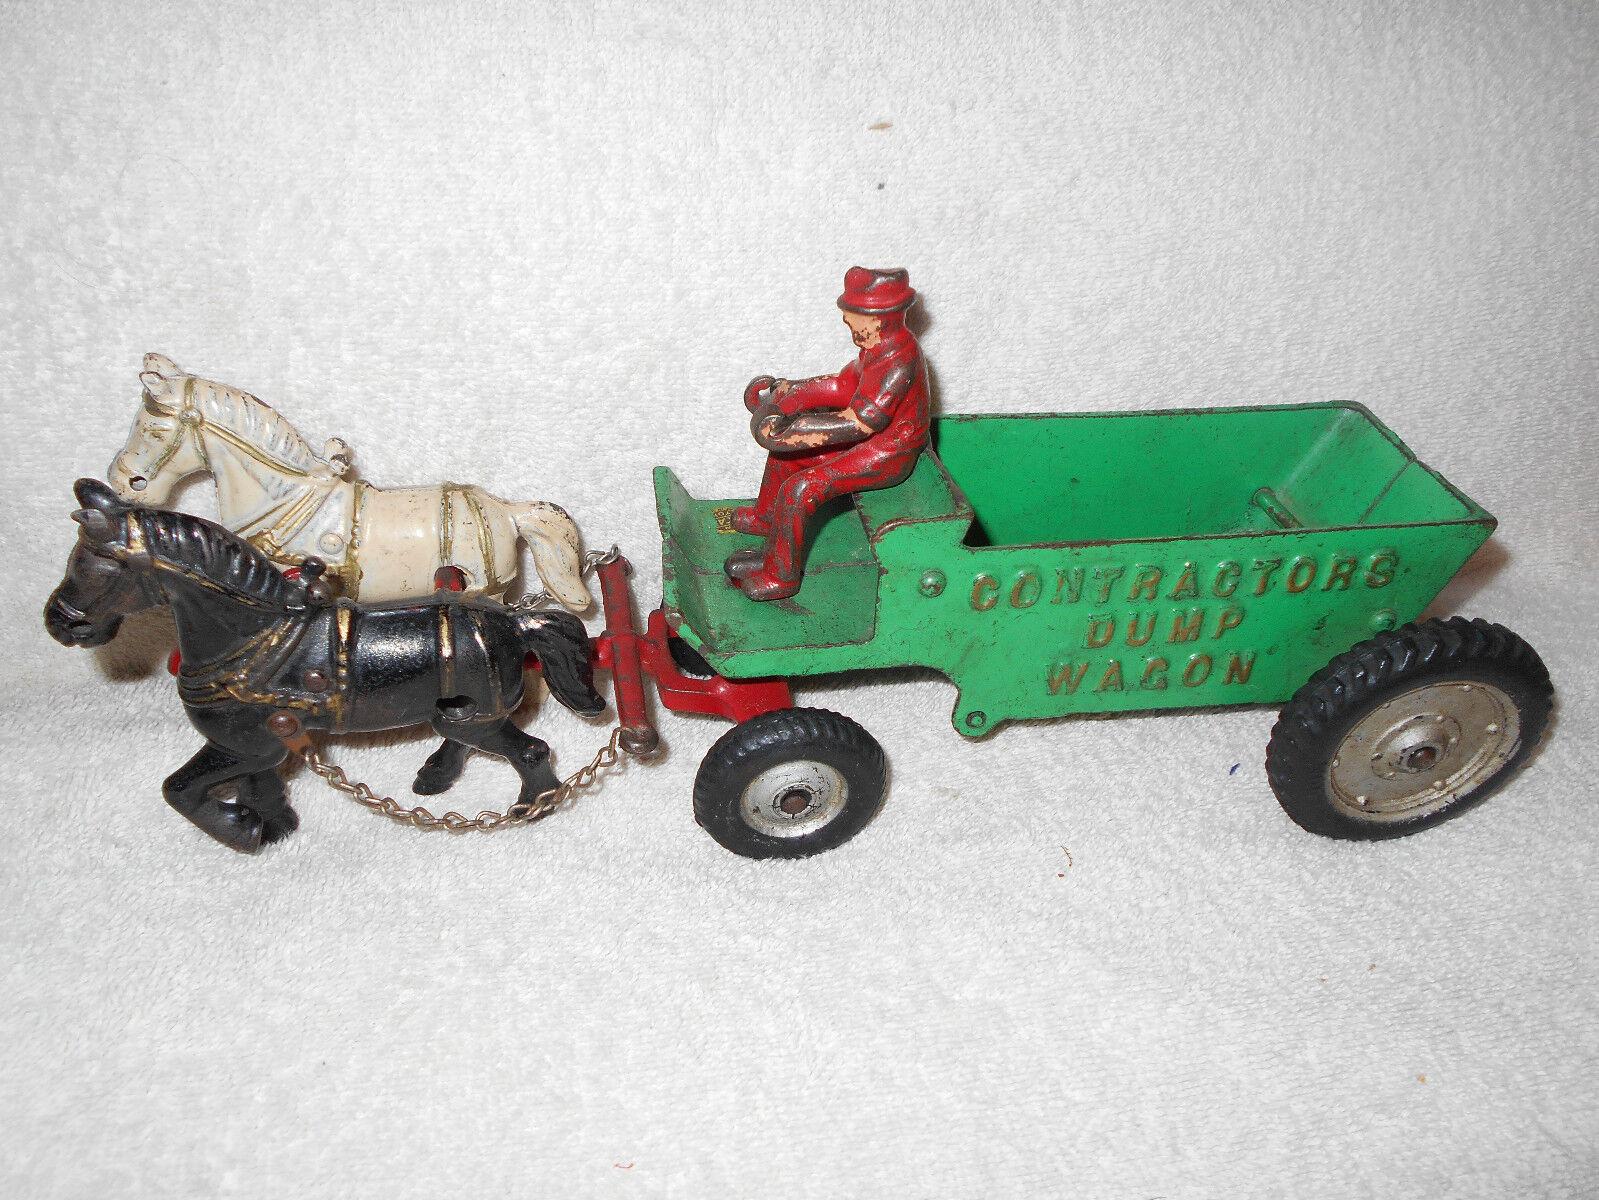 13 in Arcade Cast Iron Contractors Dump Wagon w/Two Horse Drawn & Driver ORIG